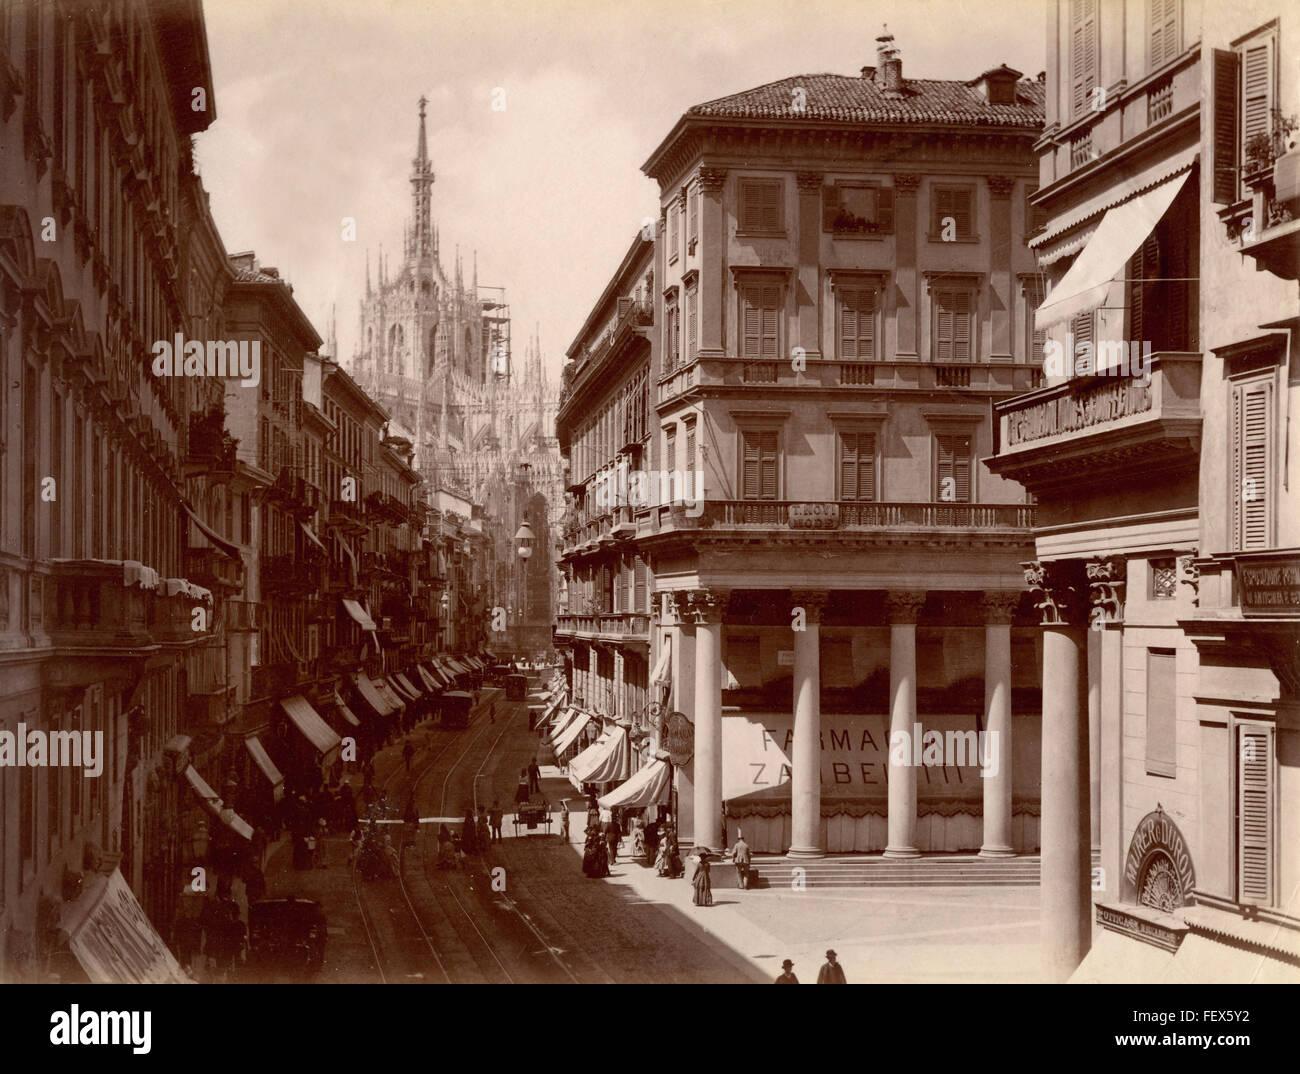 Corso Vittorio Emanuele, Milan, Italy - Stock Image